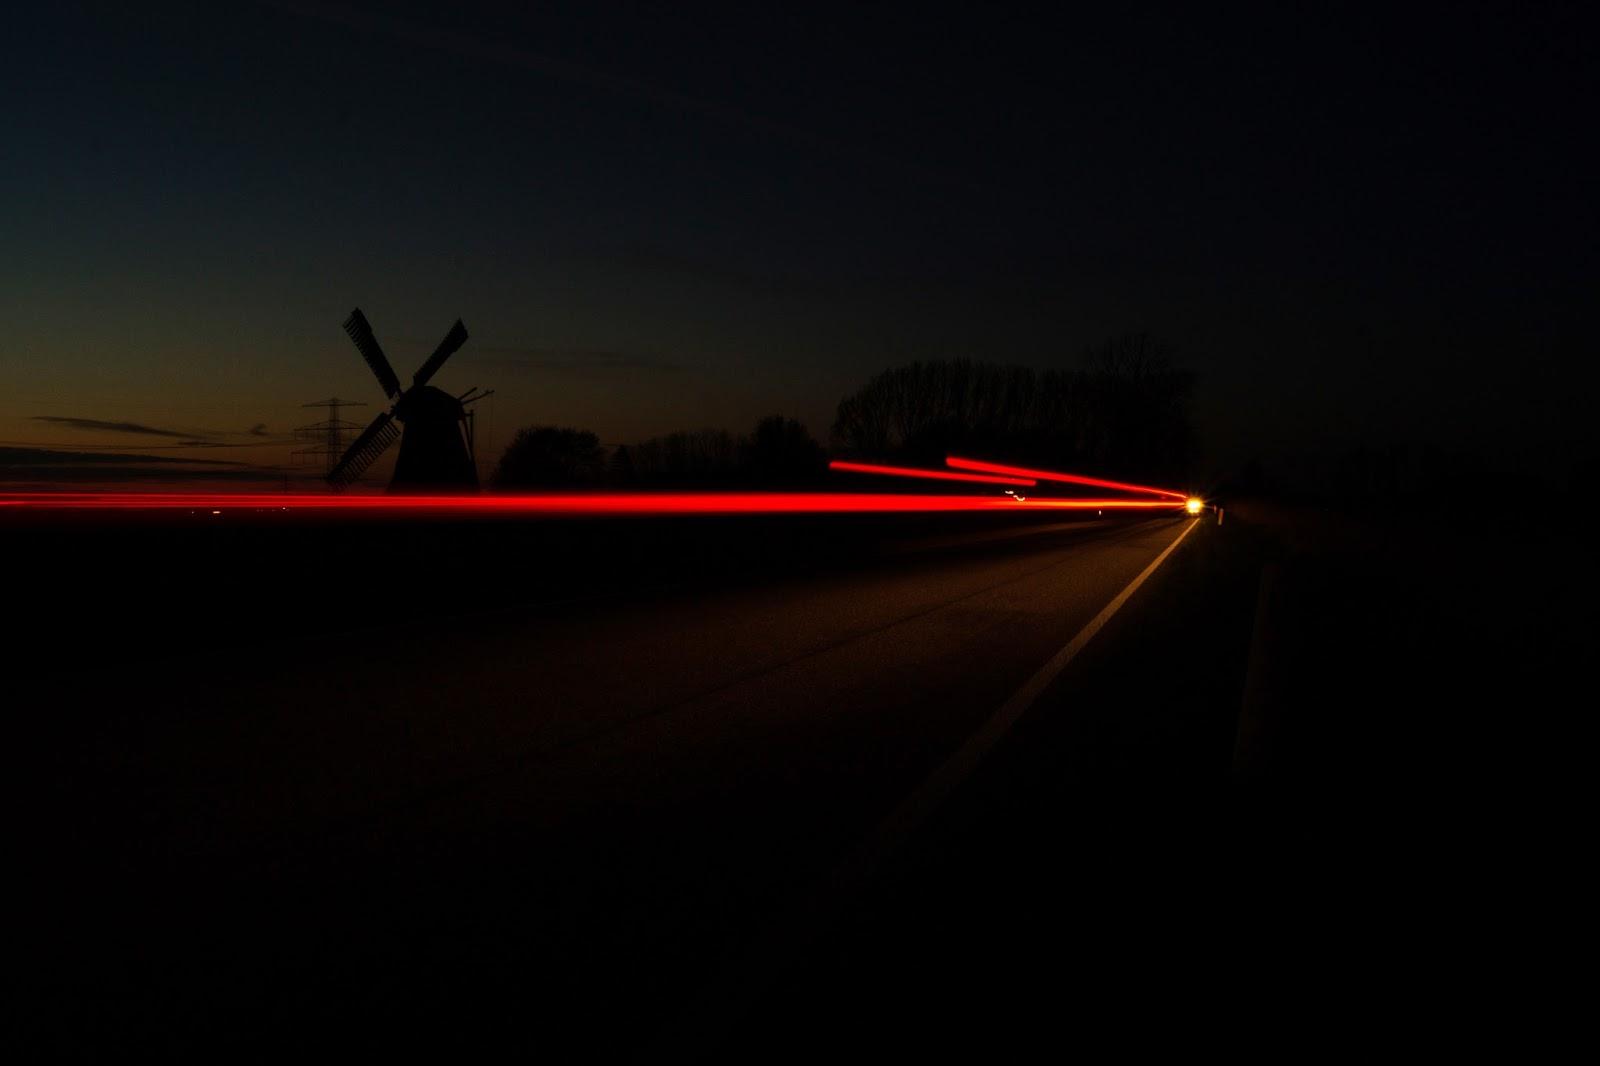 night dark long exposure windmill Δύο τεράστια ονόματα της αυτοκίνησης έρχονται Ελλάδα zblog